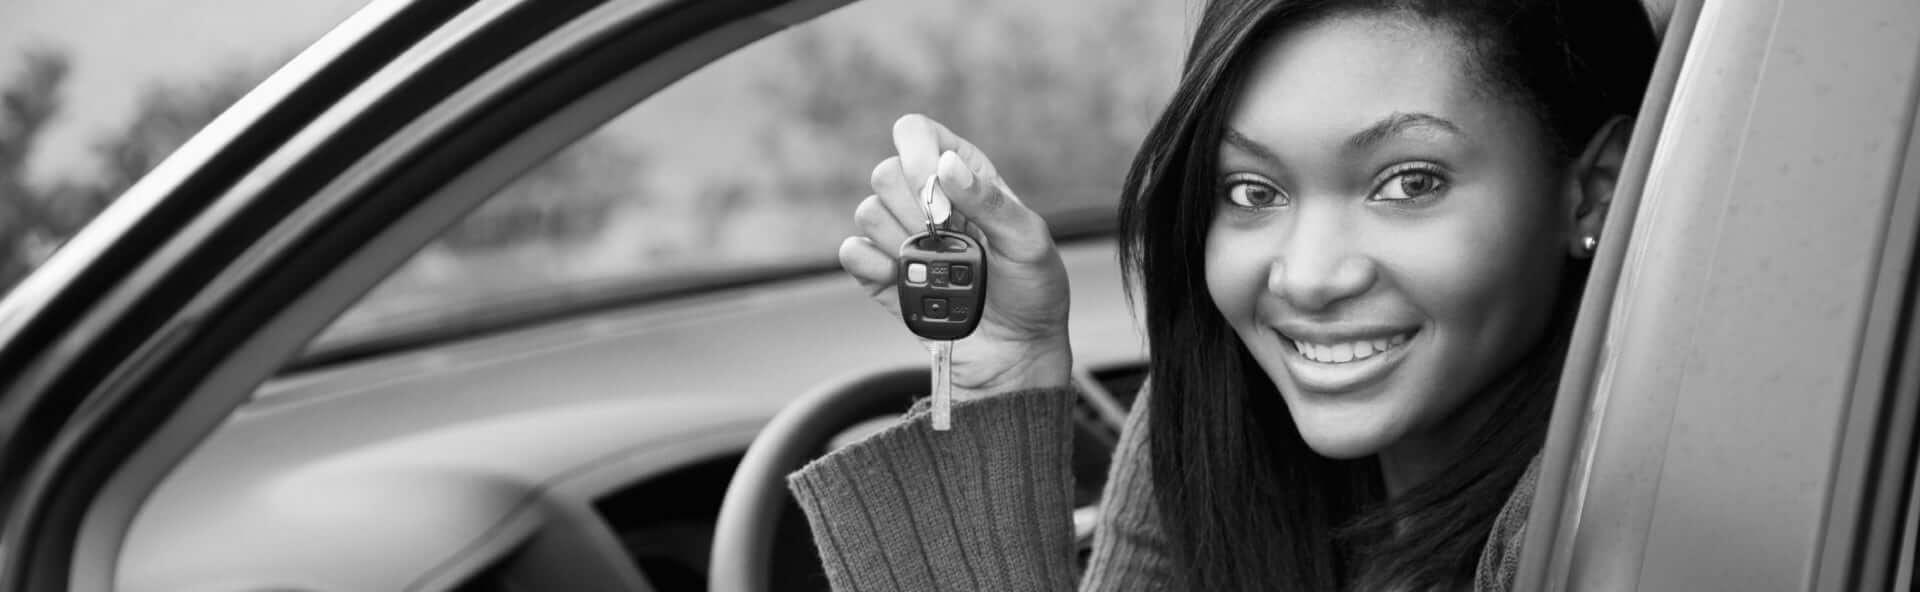 Car-Lockout-Locksmith-inBW